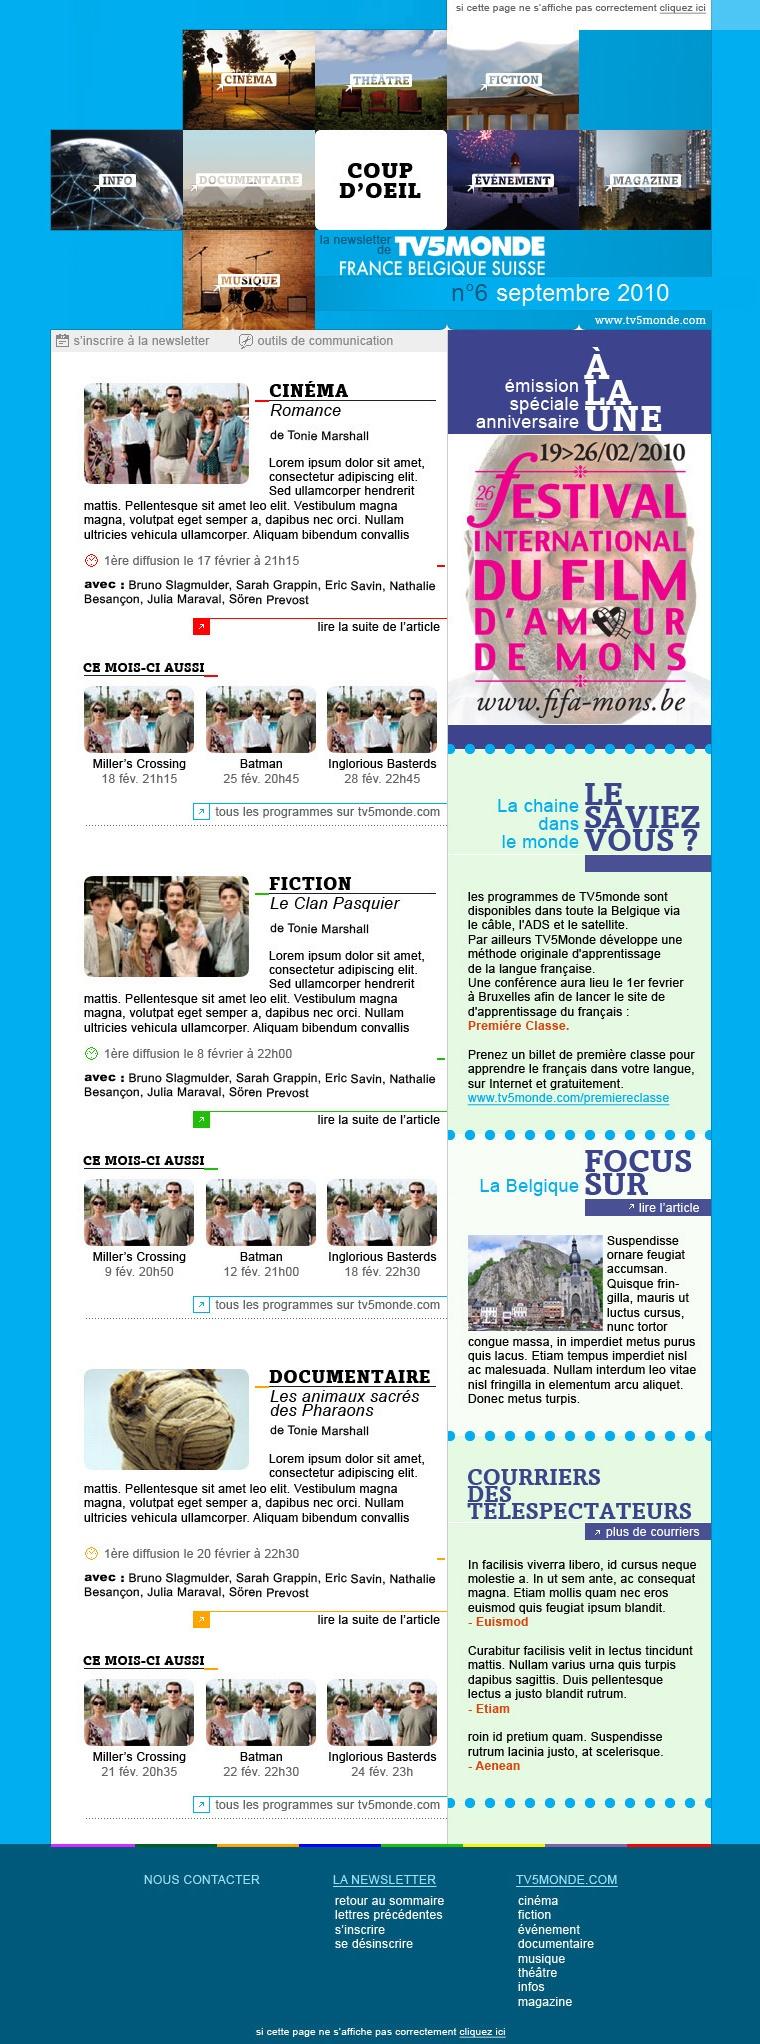 Lettre TV5 Monde FBS